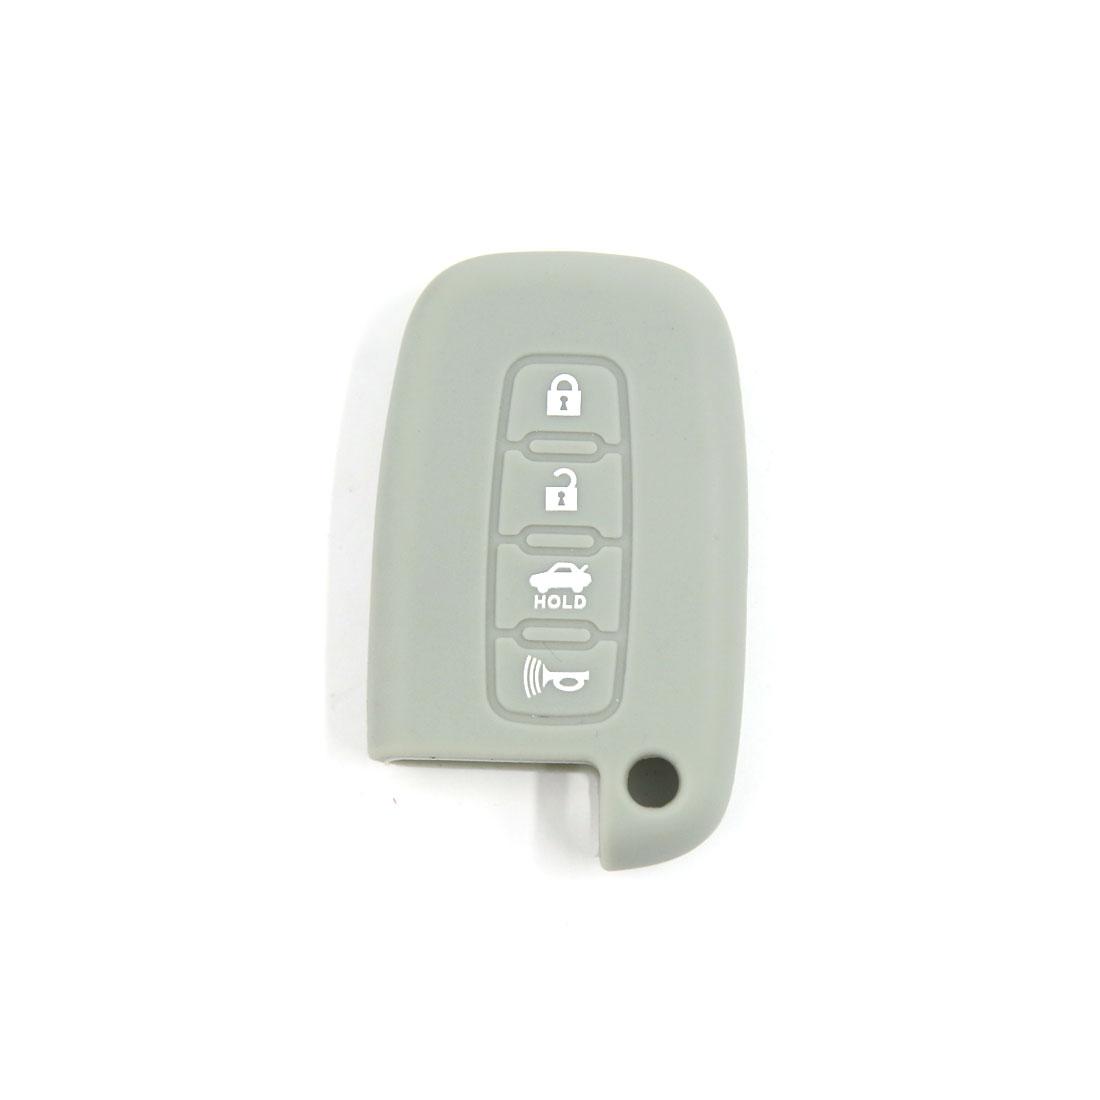 Gray Silicone Smart Key Case Cover Fob for Hyundai Sonata Genesis Elantra 4 BT